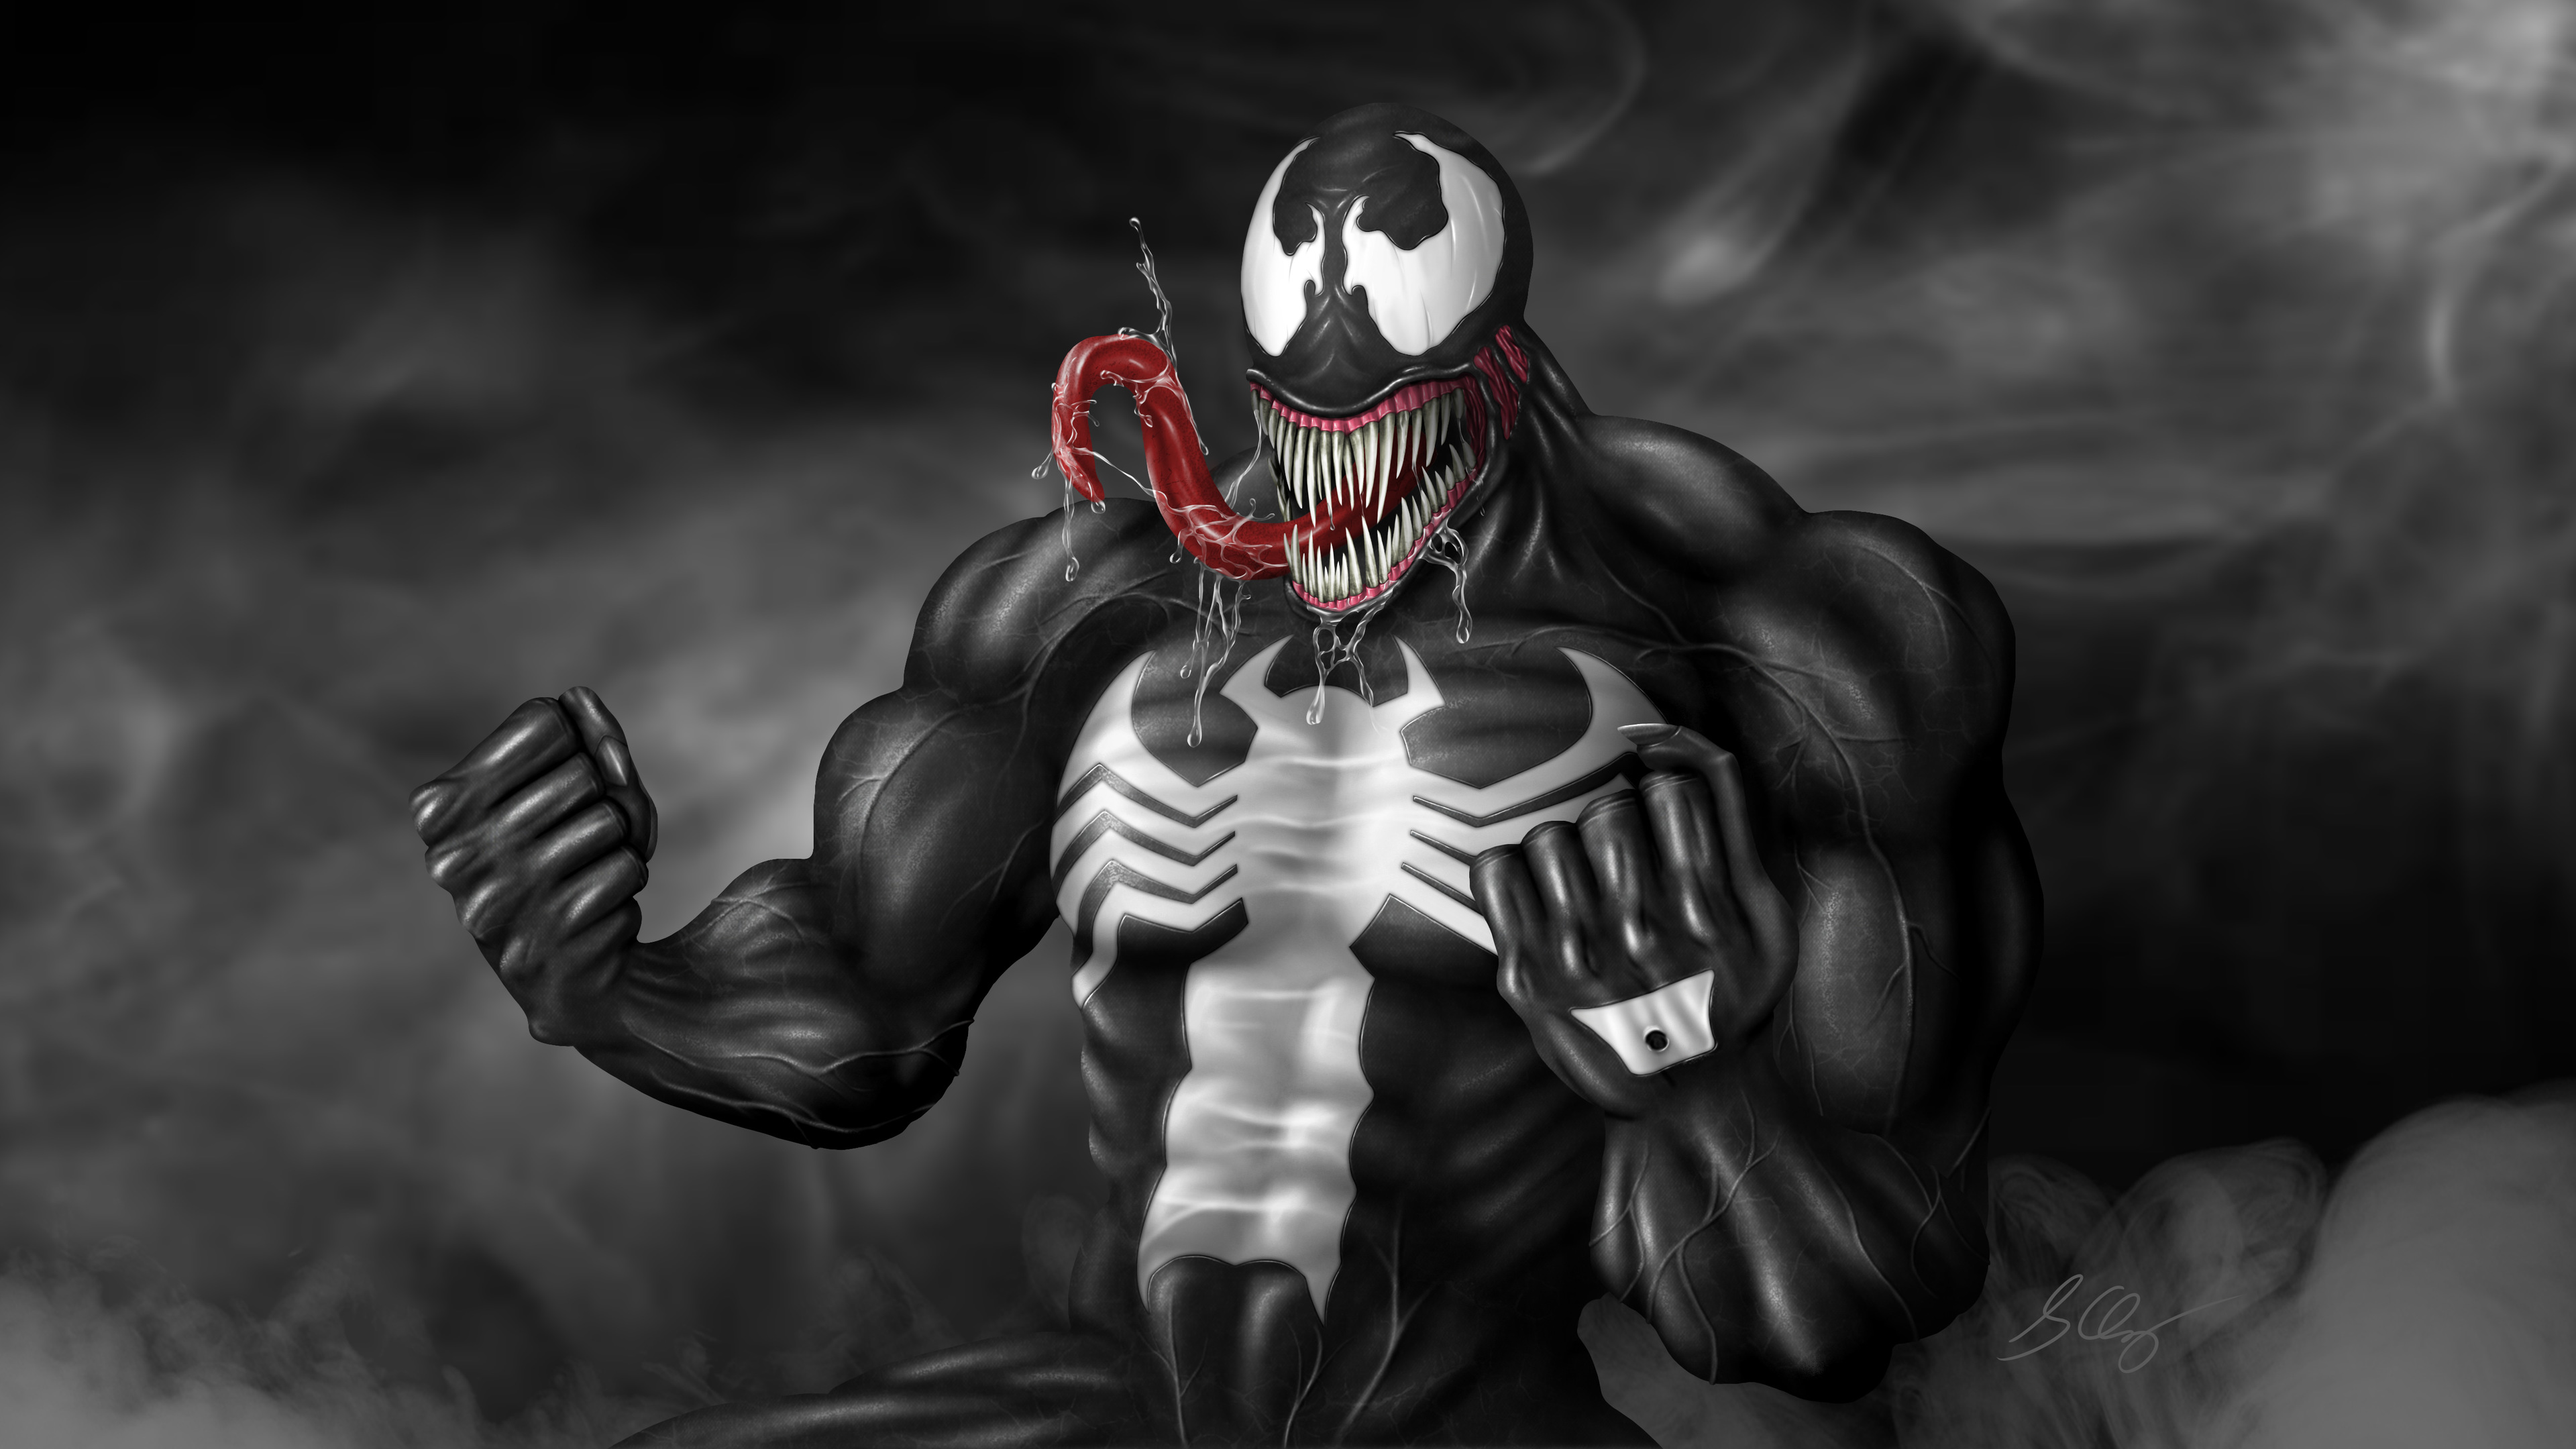 2048x2048 Venom 2018 Movie 4k Ipad Air Hd 4k Wallpapers: Venom Art Digital Venom Wallpapers, Superheroes Wallpapers